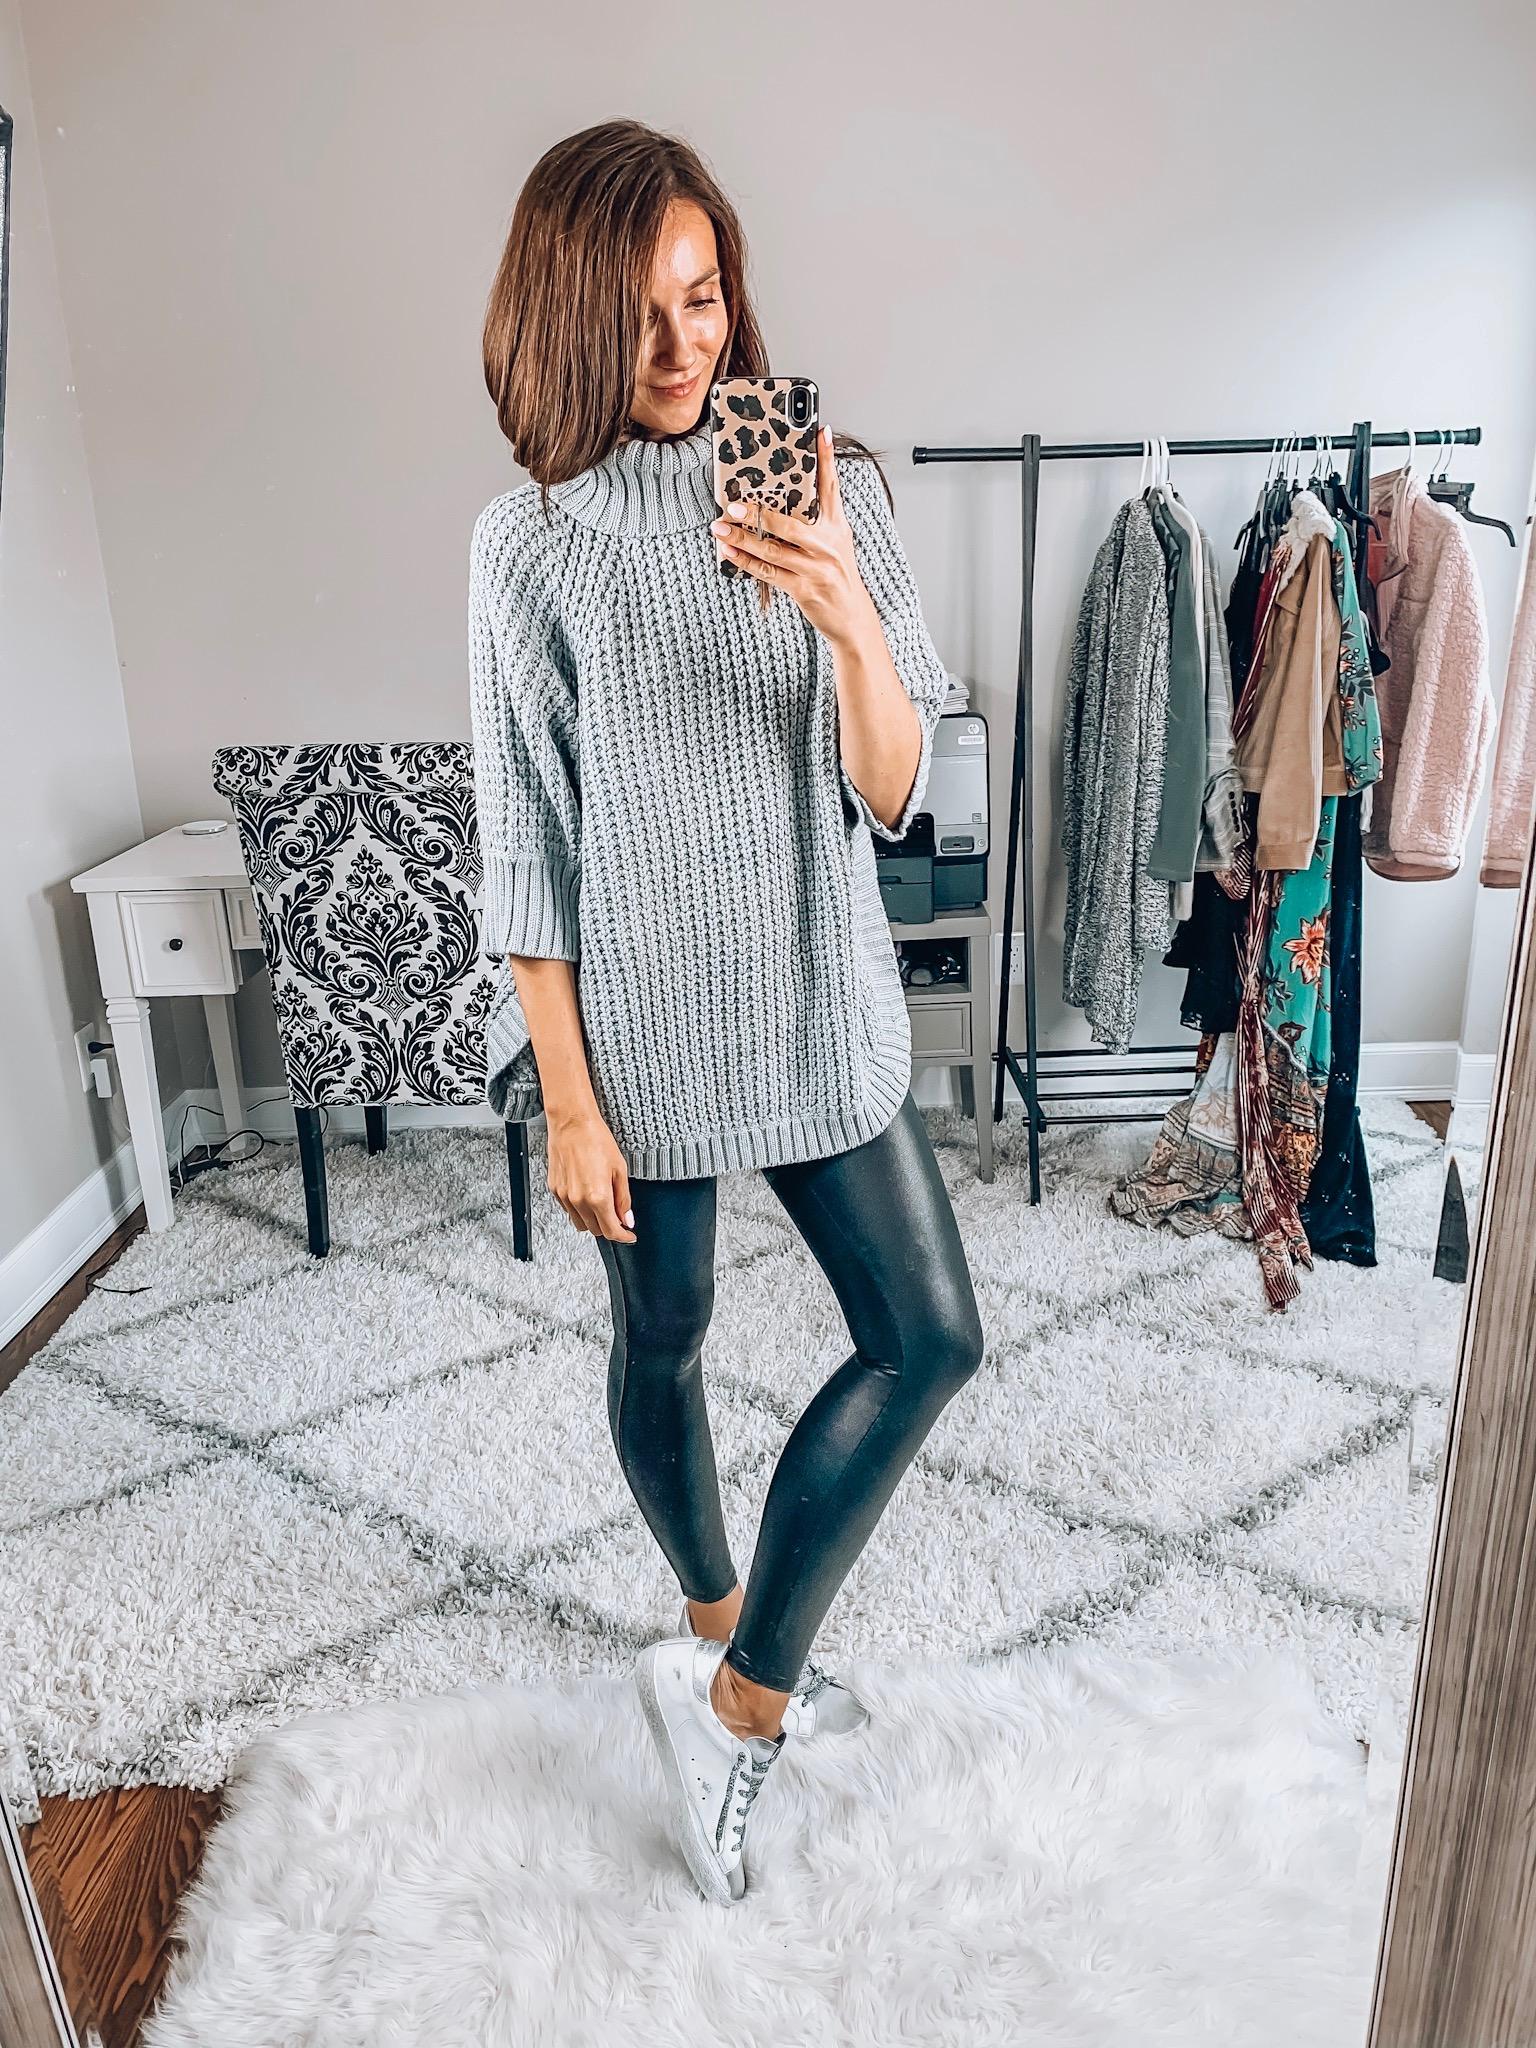 J.Crew Sweater, Spanx Leggings